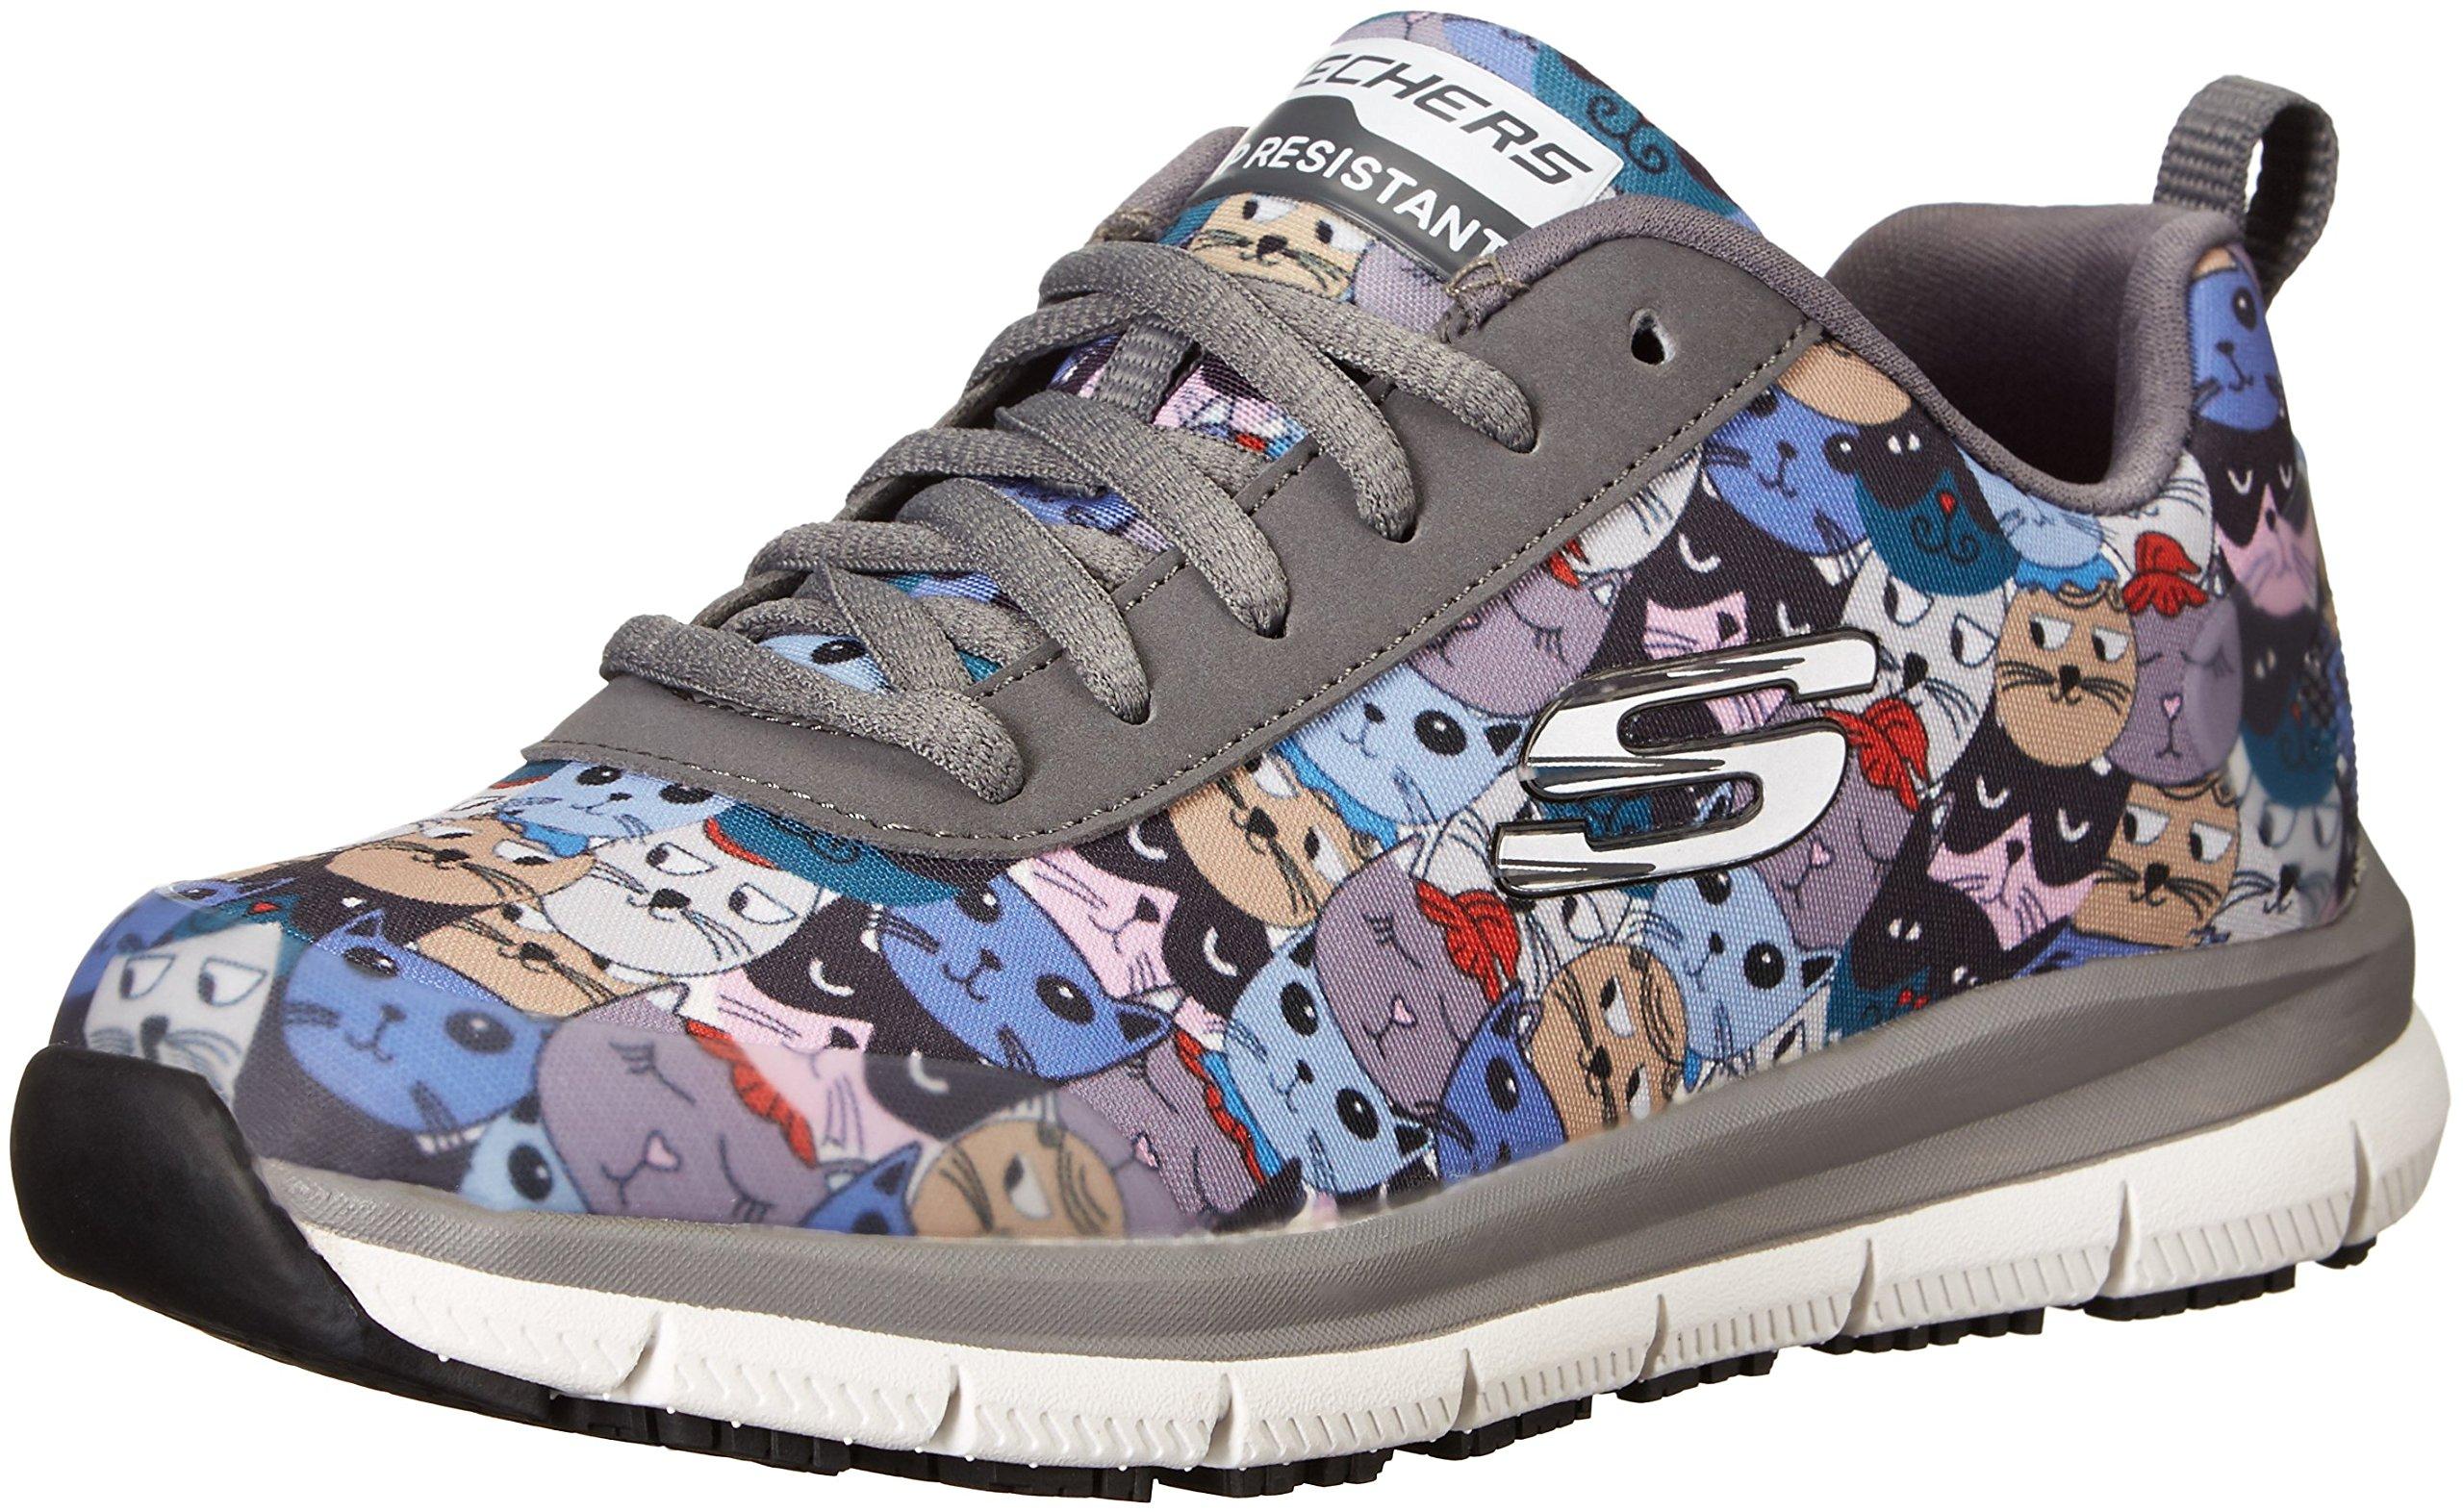 Skechers Women's Comfort Flex Sr Hc Pro Health Care Professional Shoe,Charcoal/Multi,9.5 Medium US